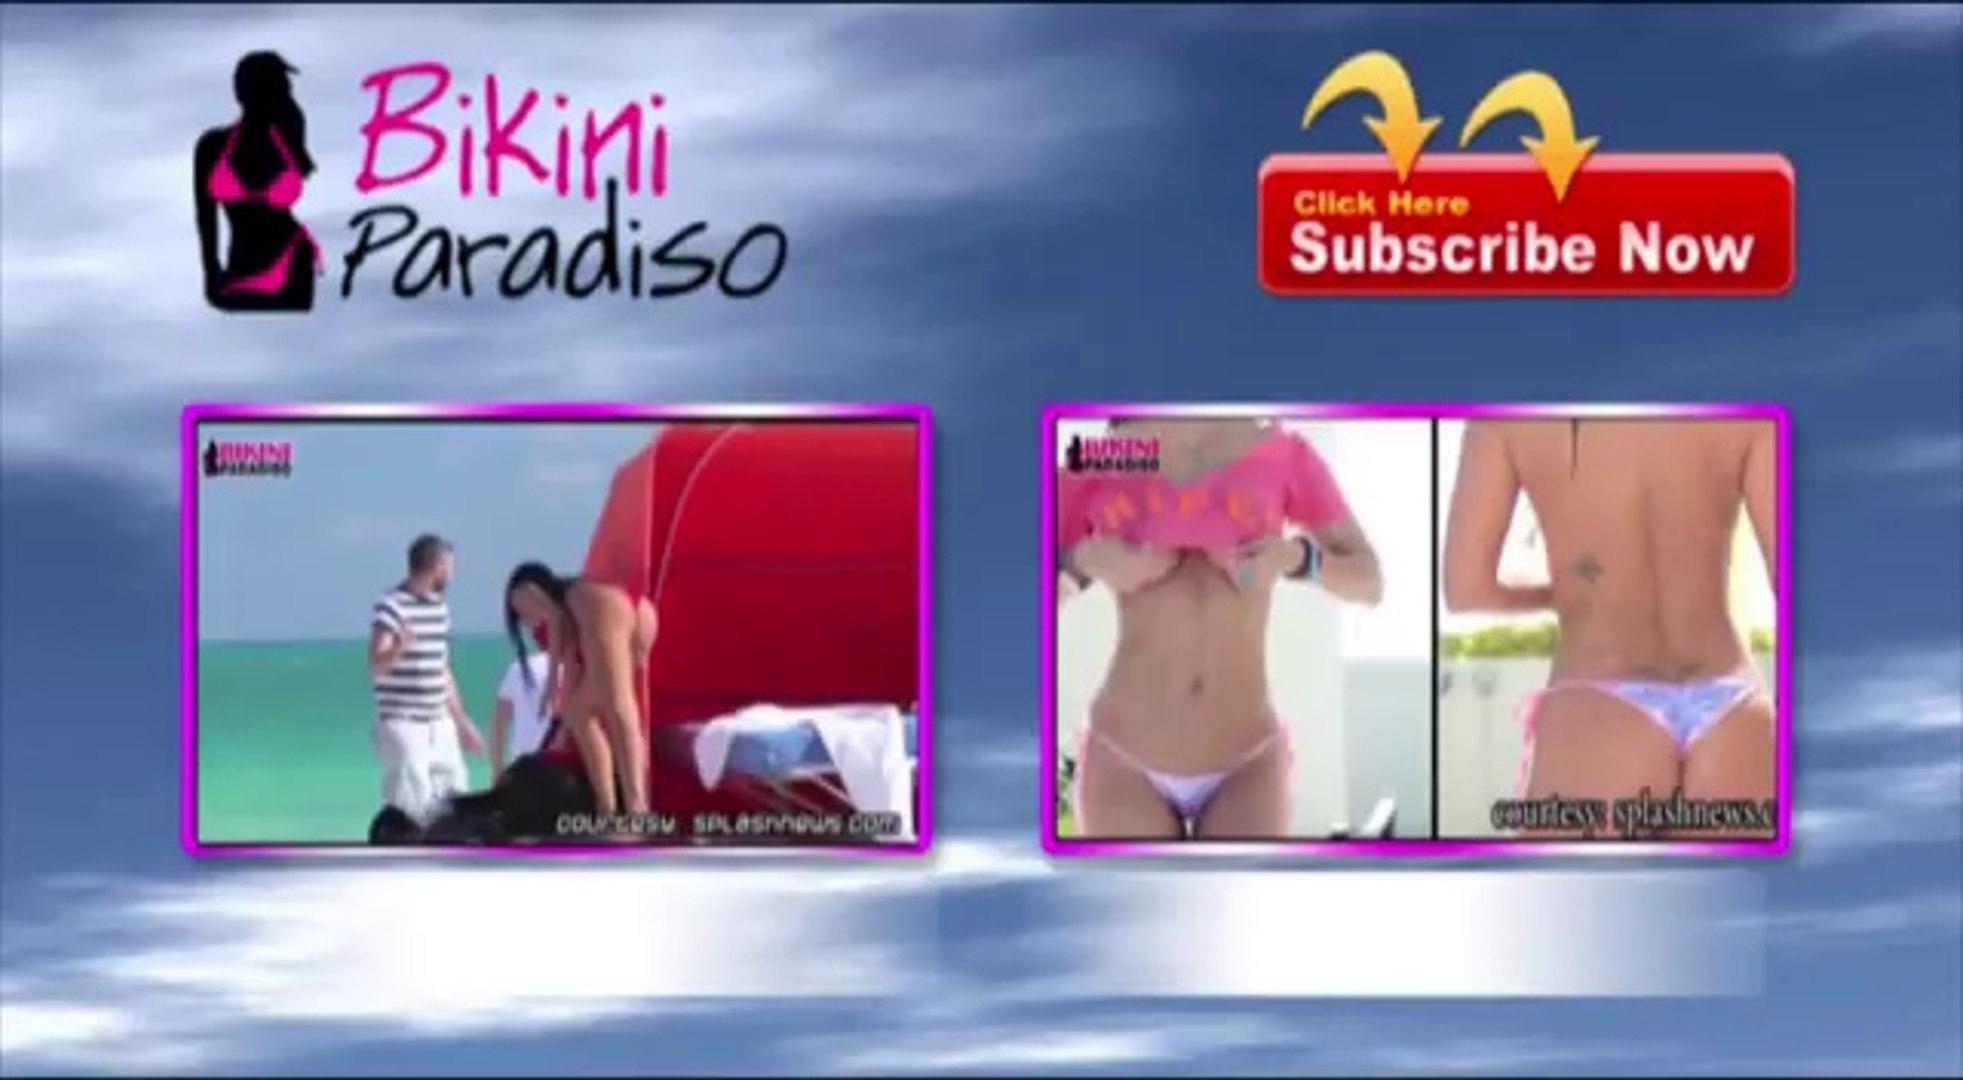 Aliona Vilani Ultra Slim Bikini Body on Miami Beach bikini paradiso FULL HD